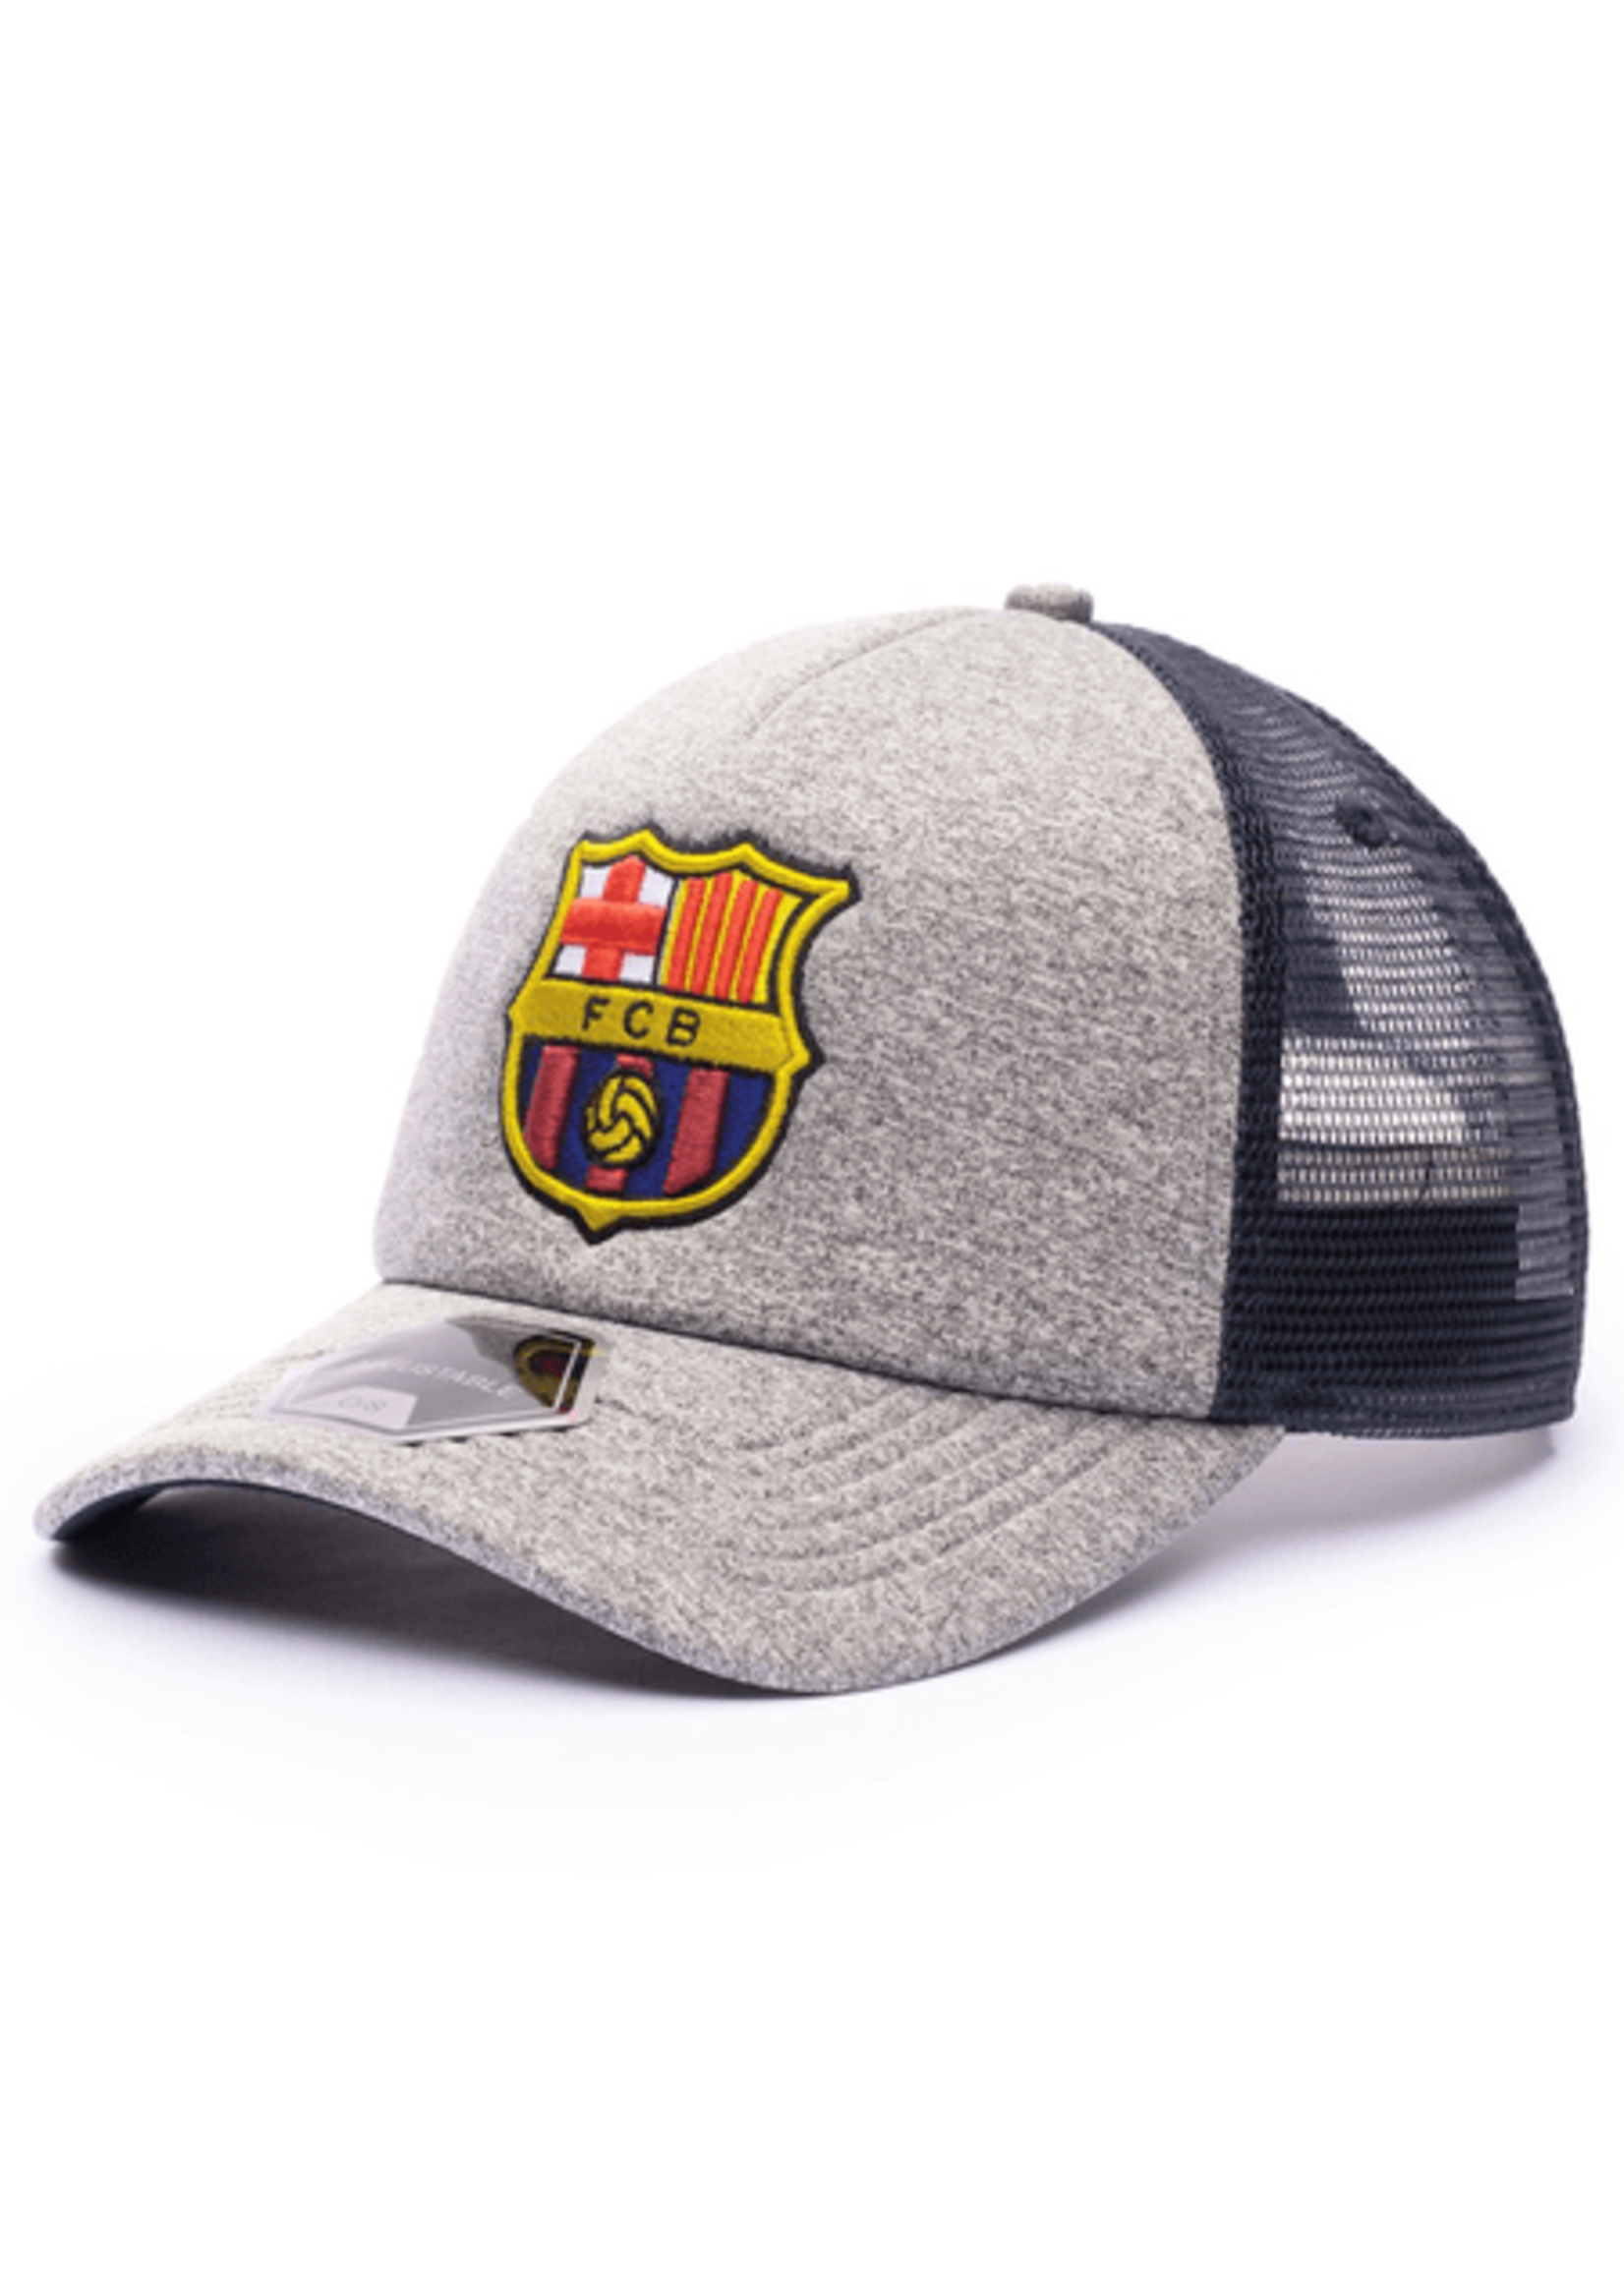 FC BARCELONA TRUCKER HAT